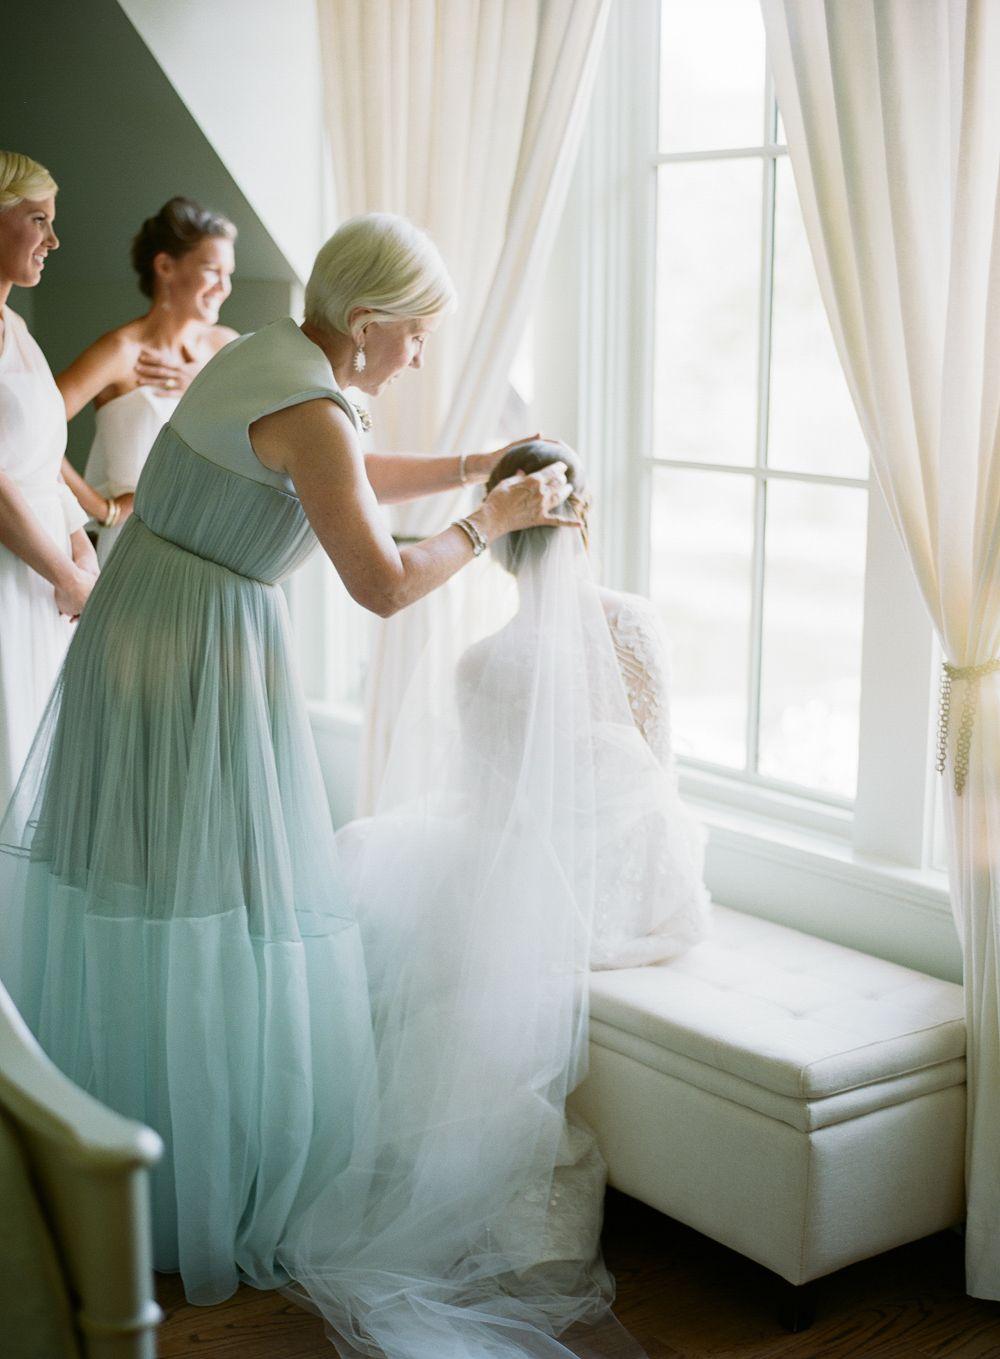 Southern style wedding dresses  RiverOaks Charleston Wedding by Elisa Bricker  Southern Style